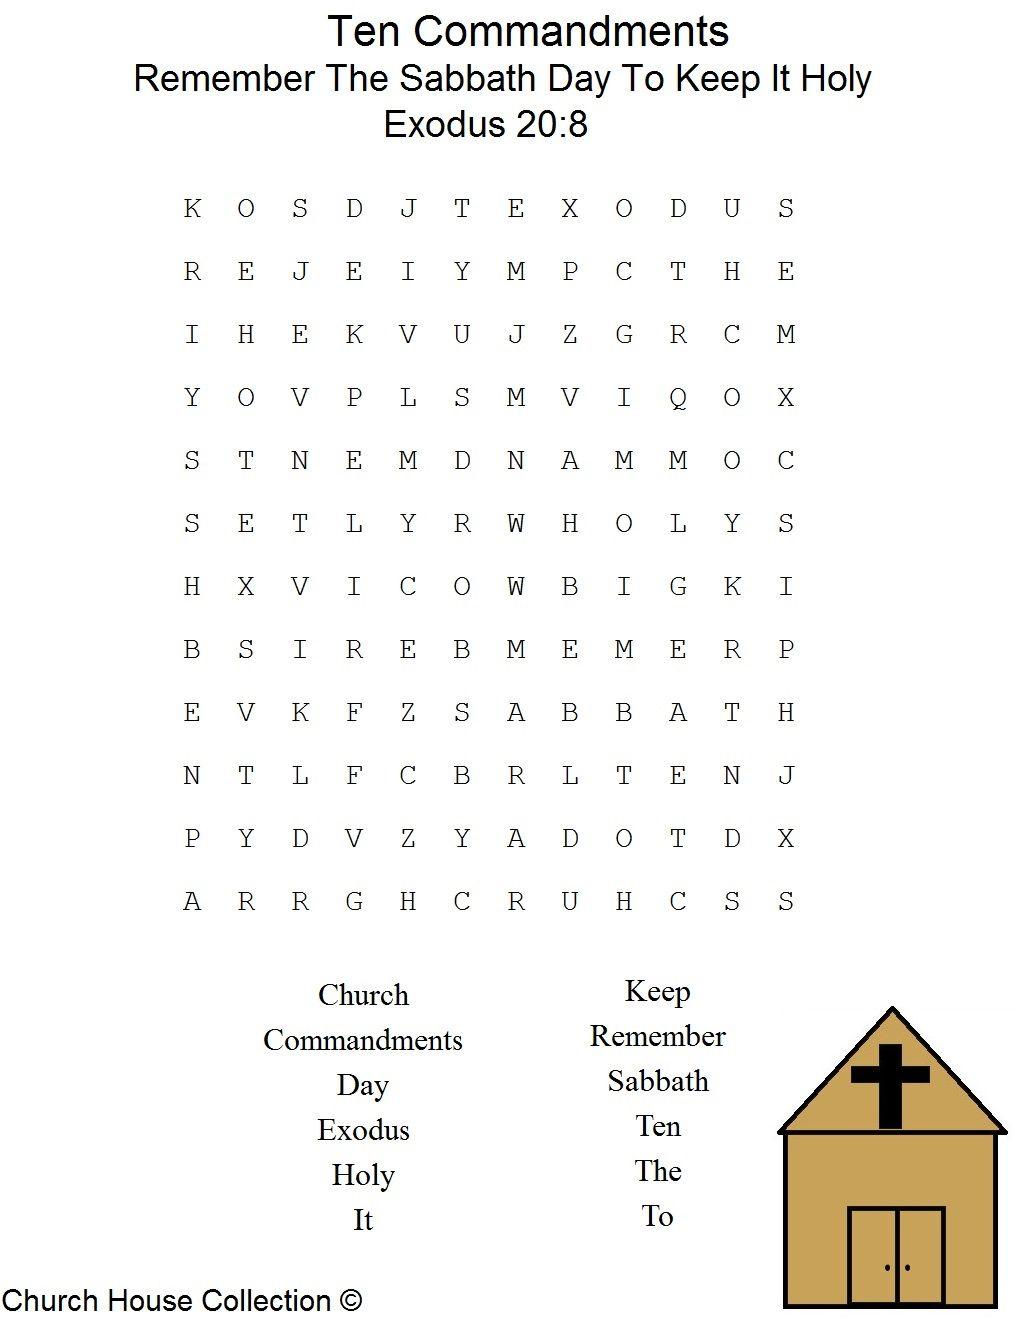 Printables 10 Commandments Worksheet commandments worksheets for kids davezan 10 davezan